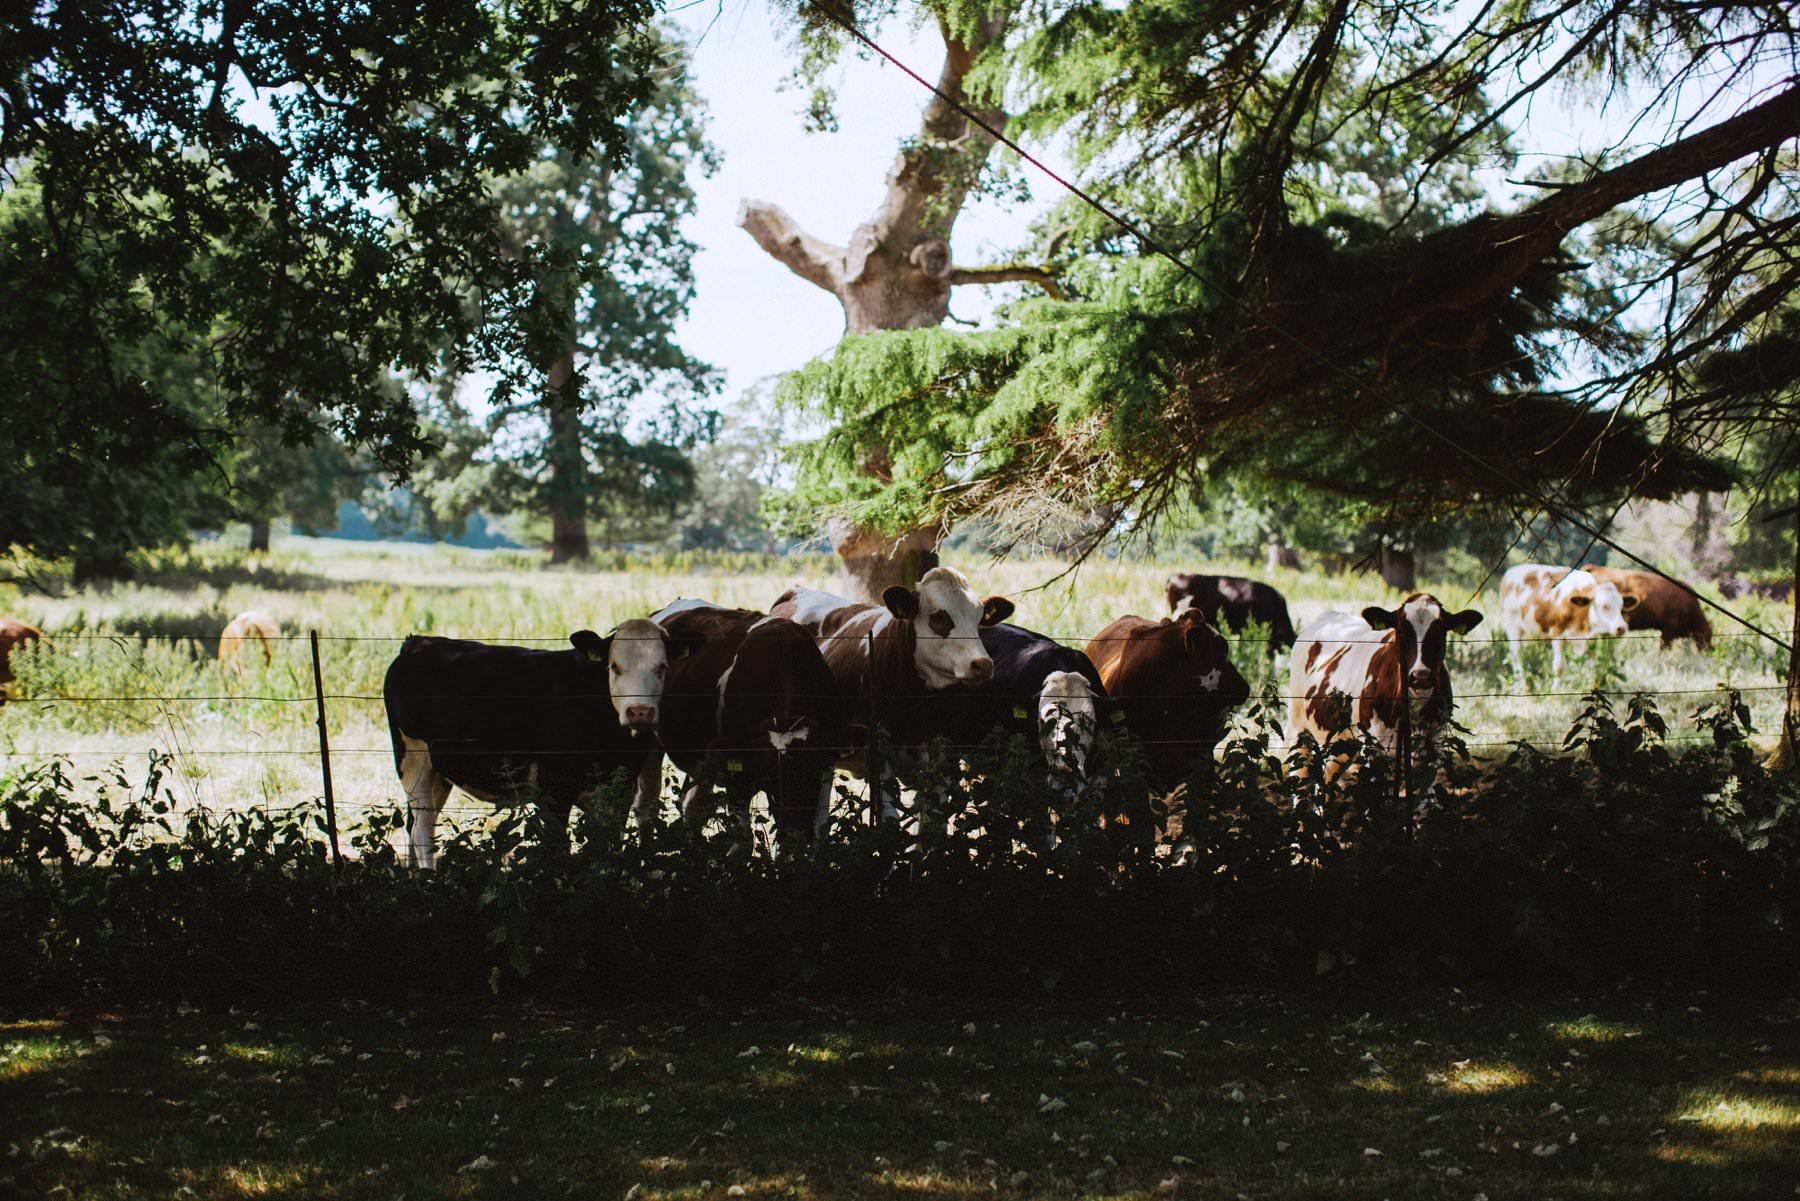 cattle in the fields of larchfield estate northern ireland